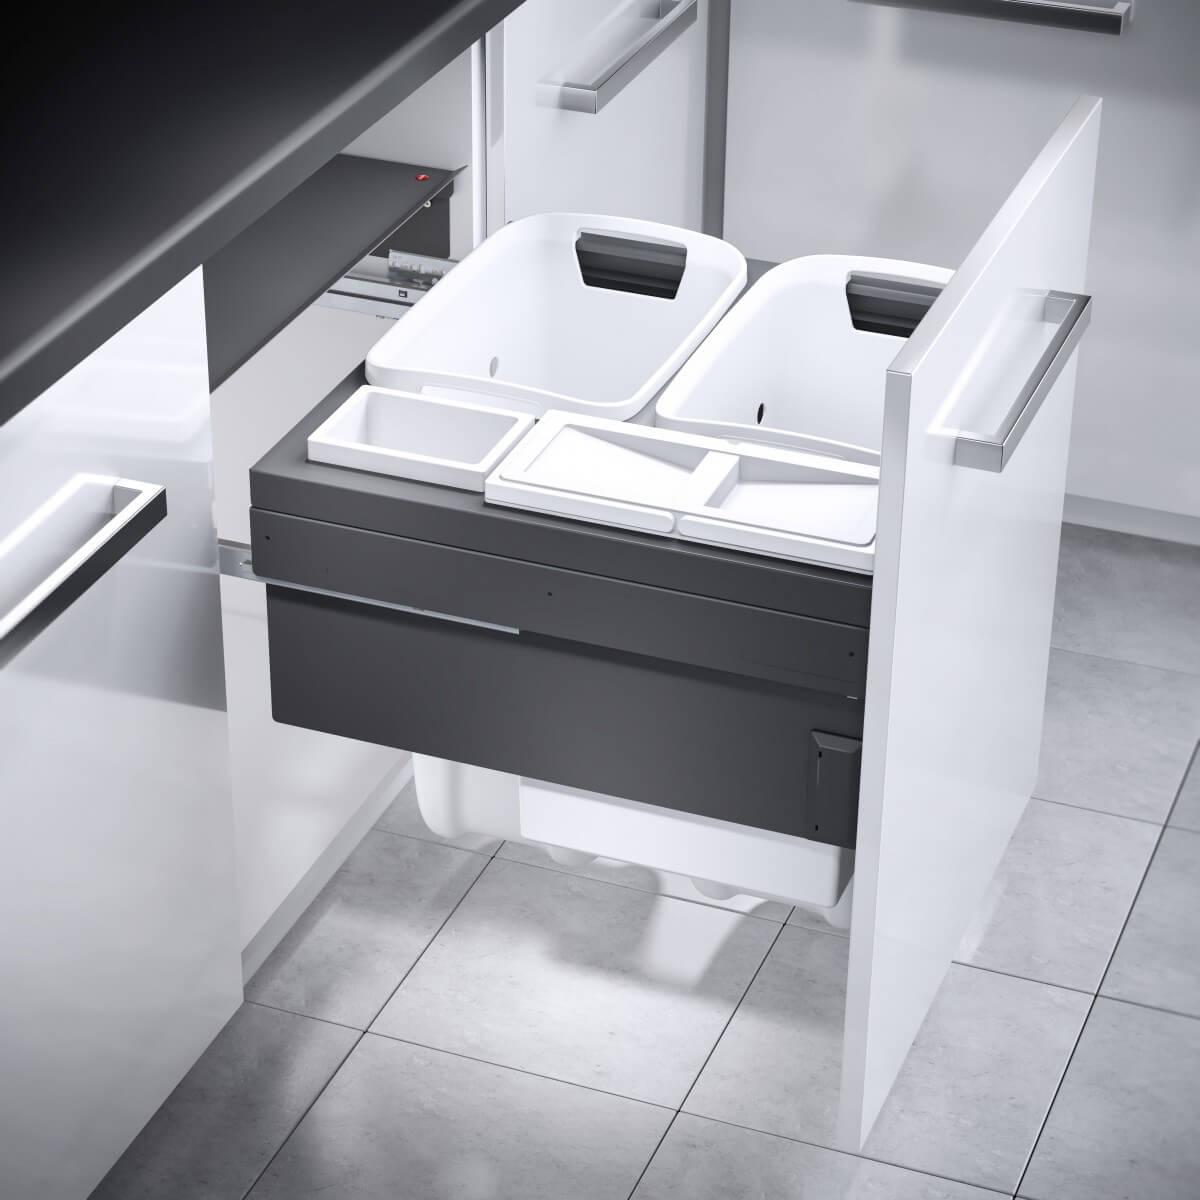 Hailo Laundry Carrier 600 dunkelgrau